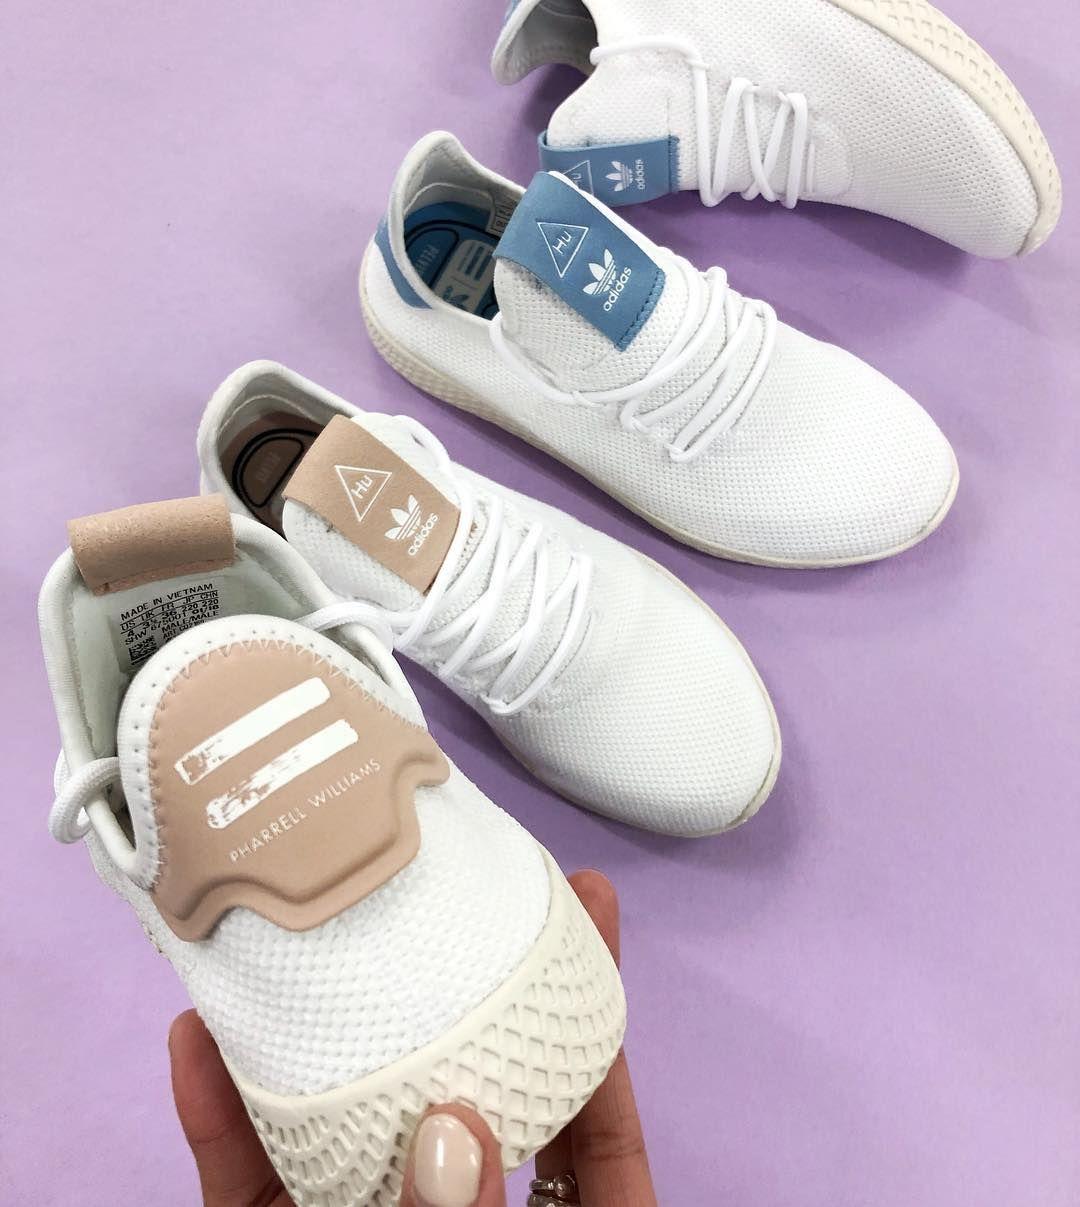 Adidas Originals Pharrell Williams Tennis Hu Pink Tennis Shoes Outfit Sneakers Fashion Williams Tennis